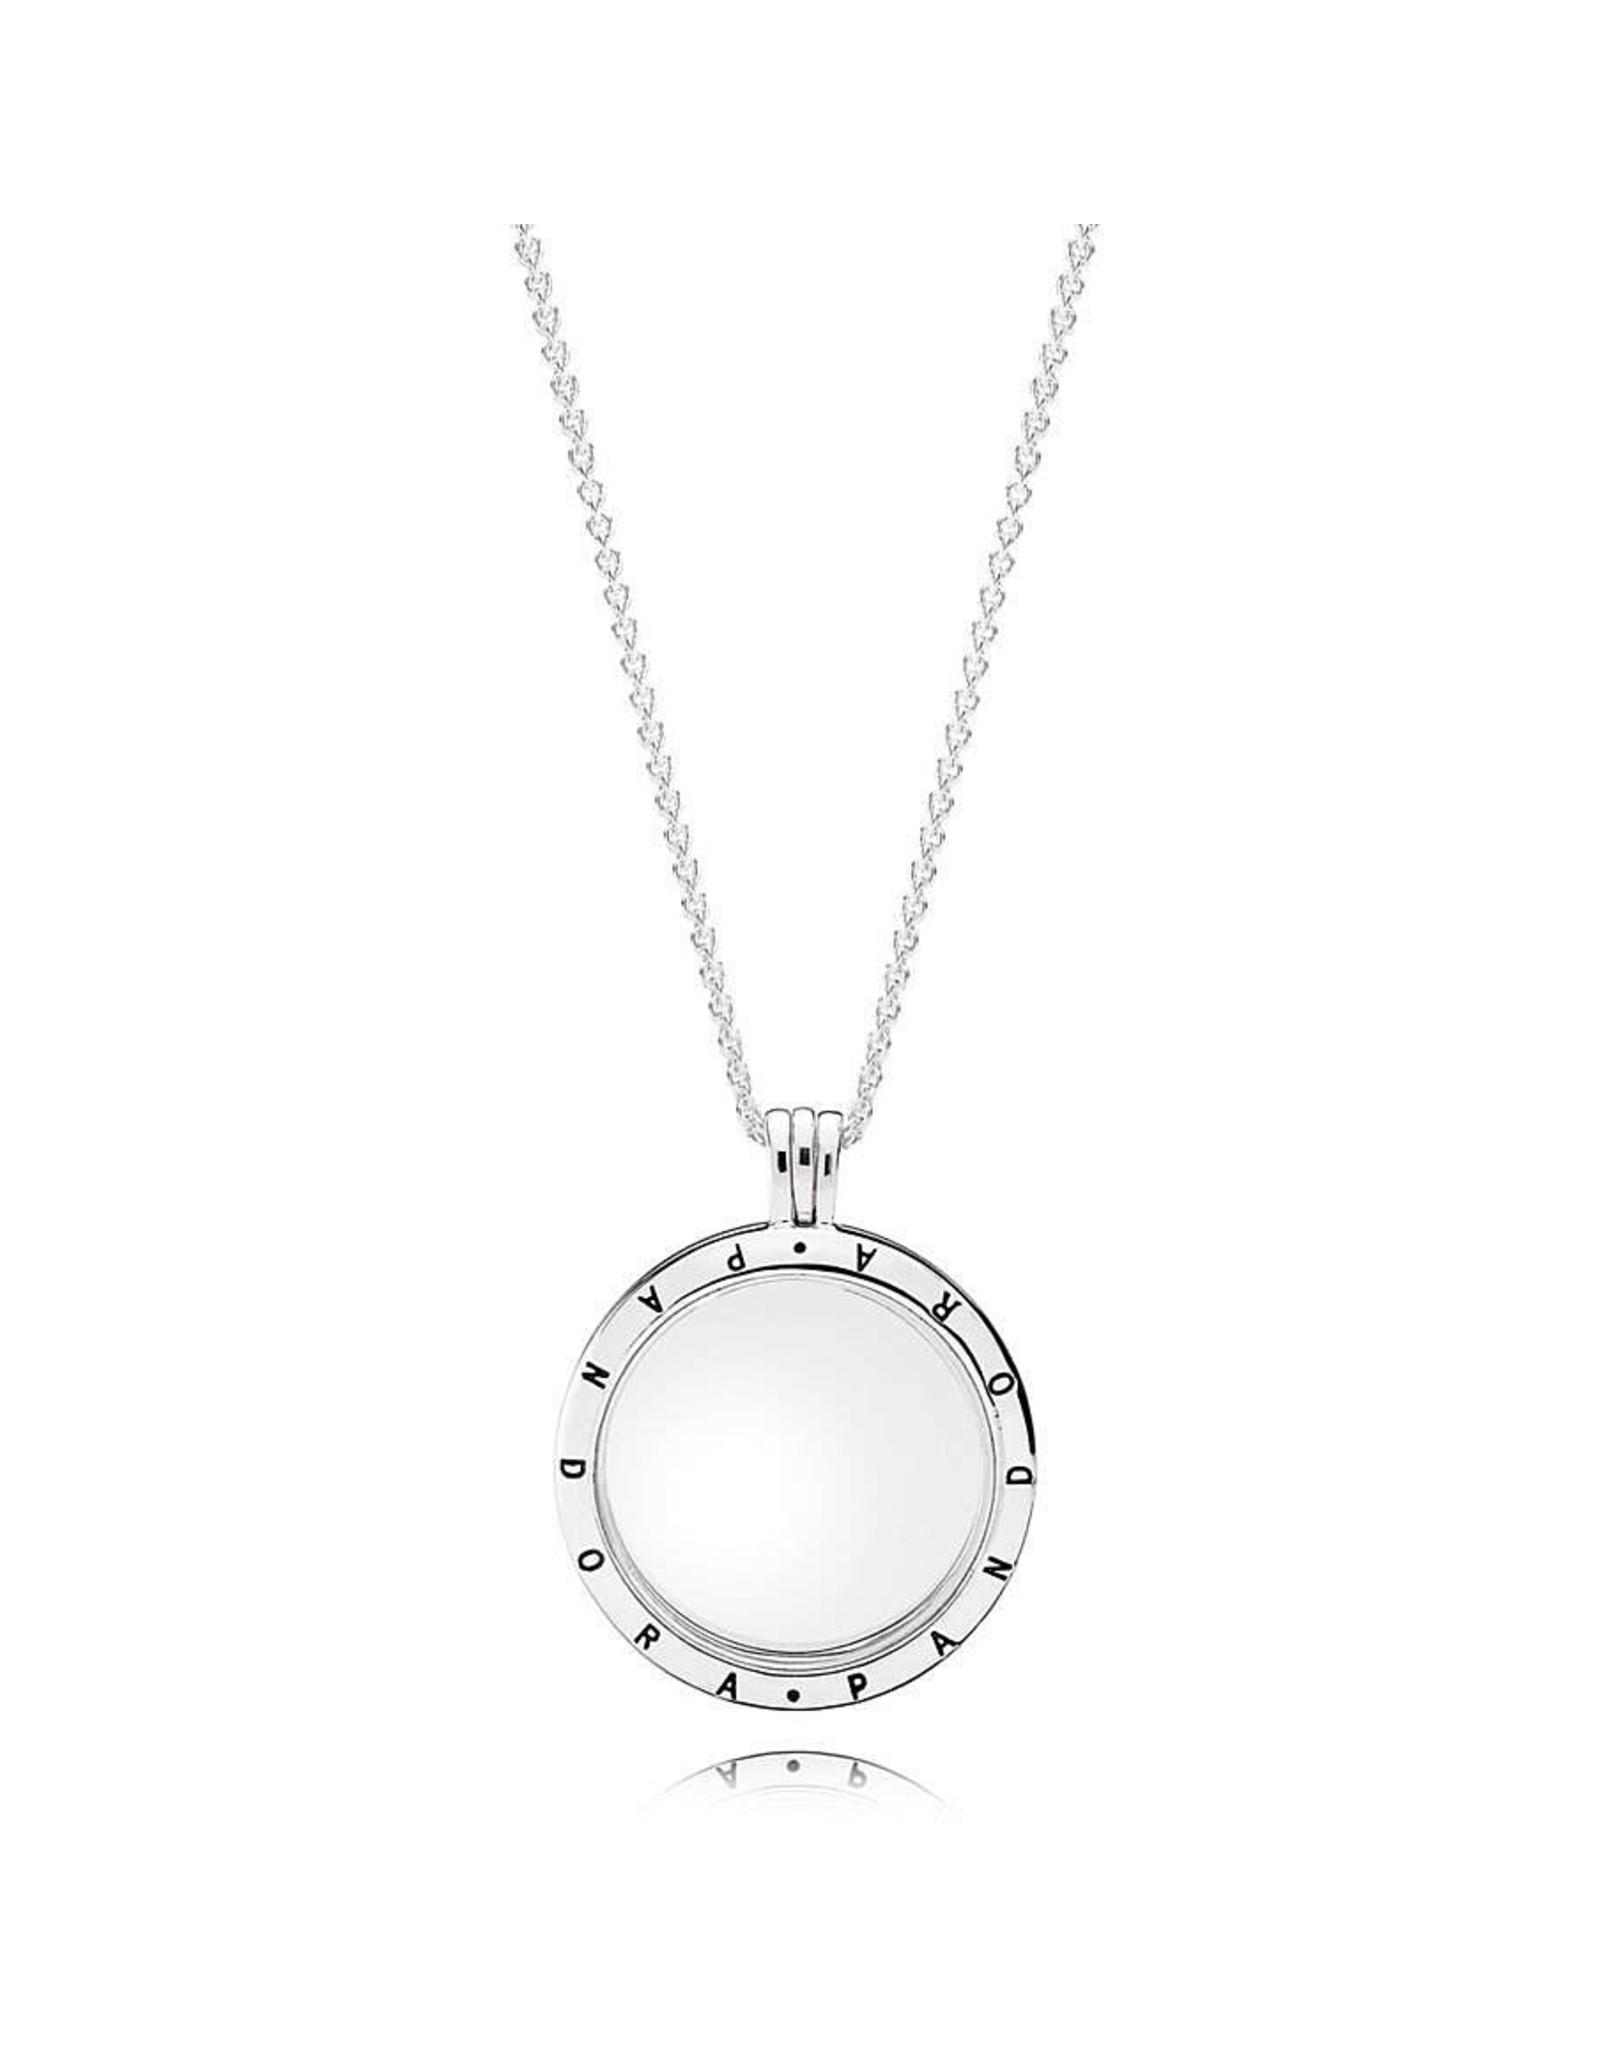 Pandora Pandora Necklace Large PANDORA Floating Locket with Sapphire Crystal Glass 75cm 75 cm